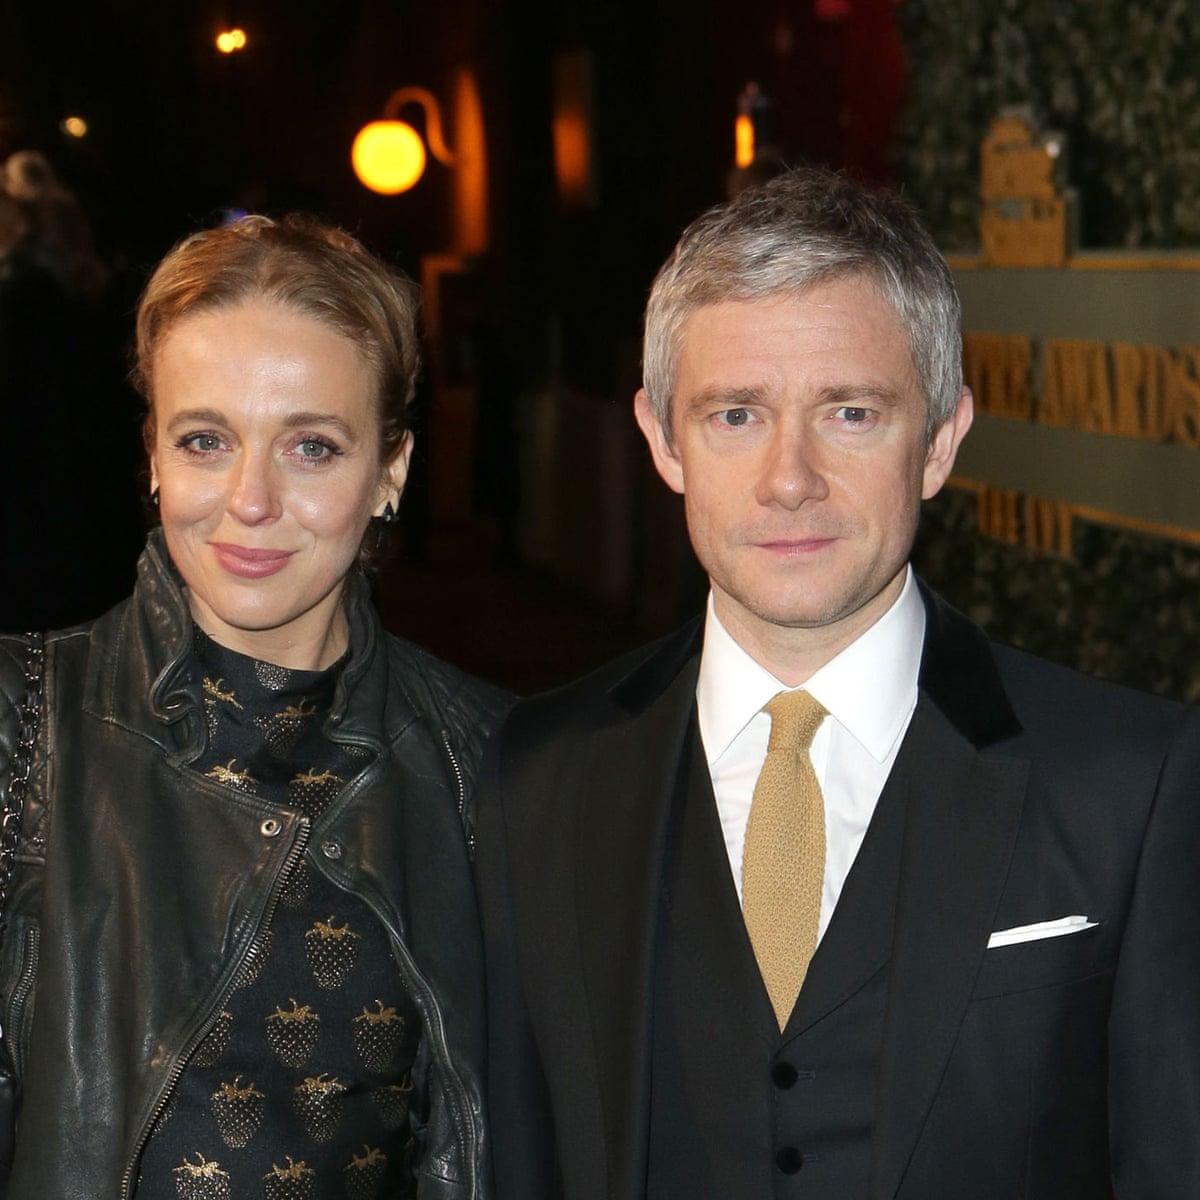 Martin Freeman with his ex-wife Amanda Abbington | Source: TheGuardian.com